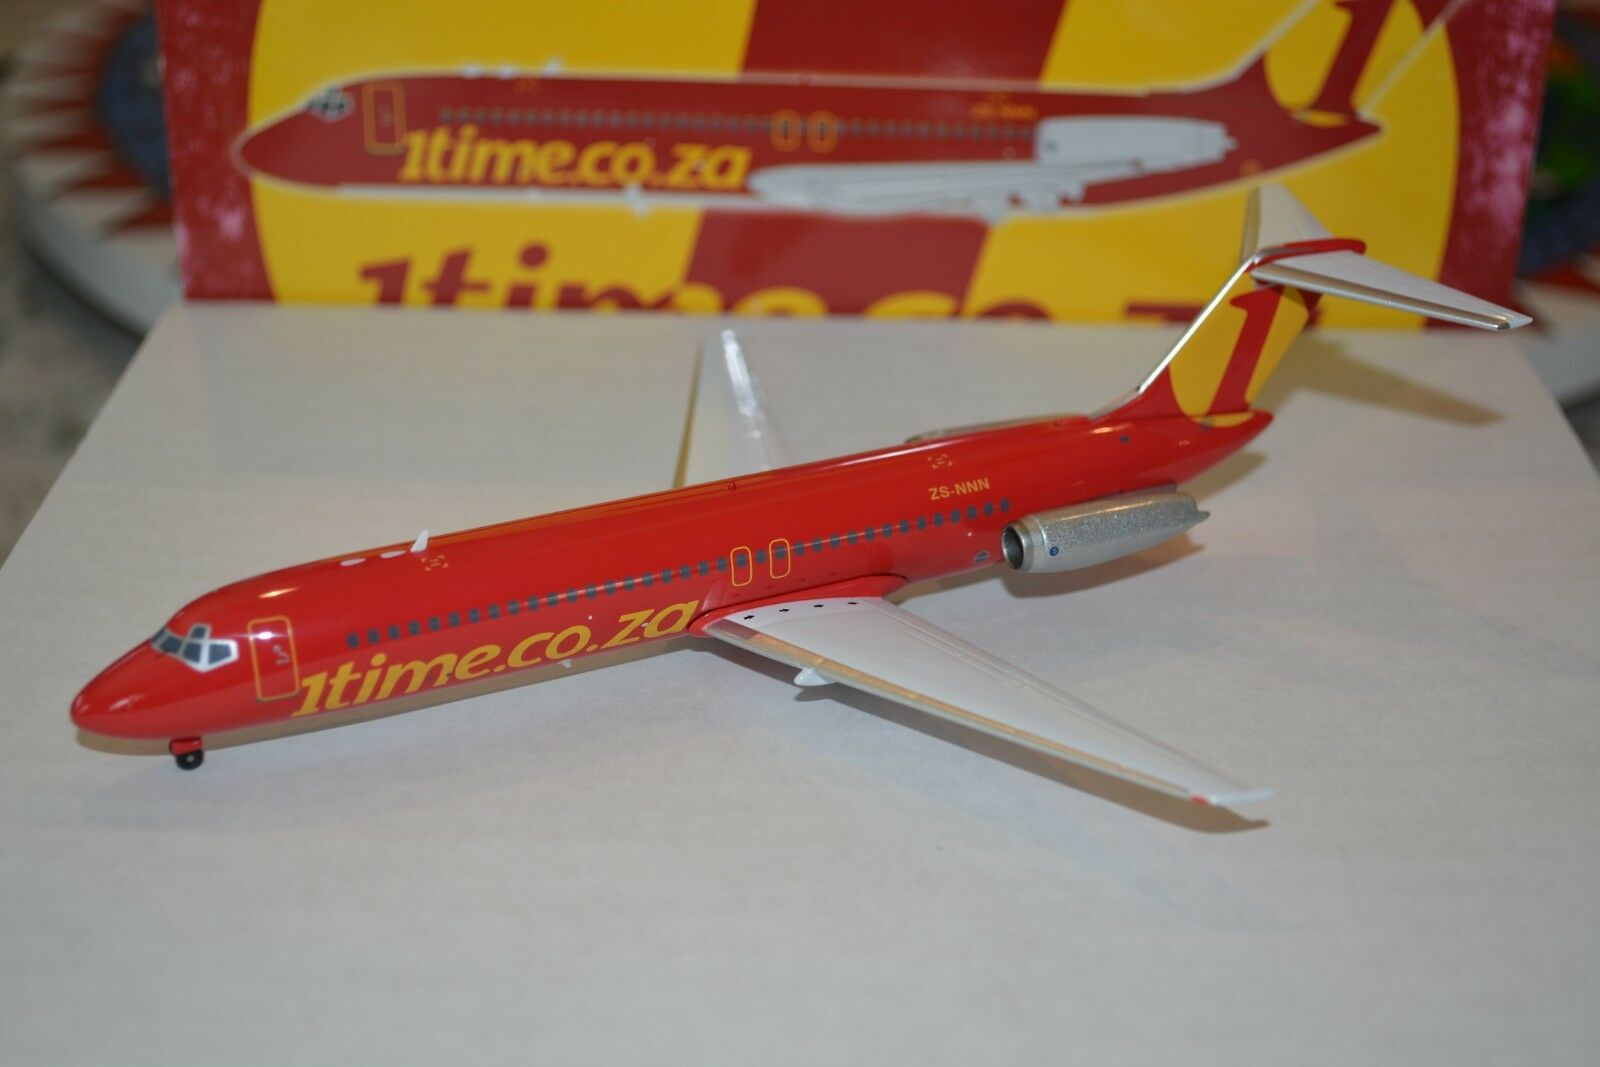 Inflight 200 1 200 1time.co.za McDonnell Douglas DC-9-30, ZS-NNN, NIB